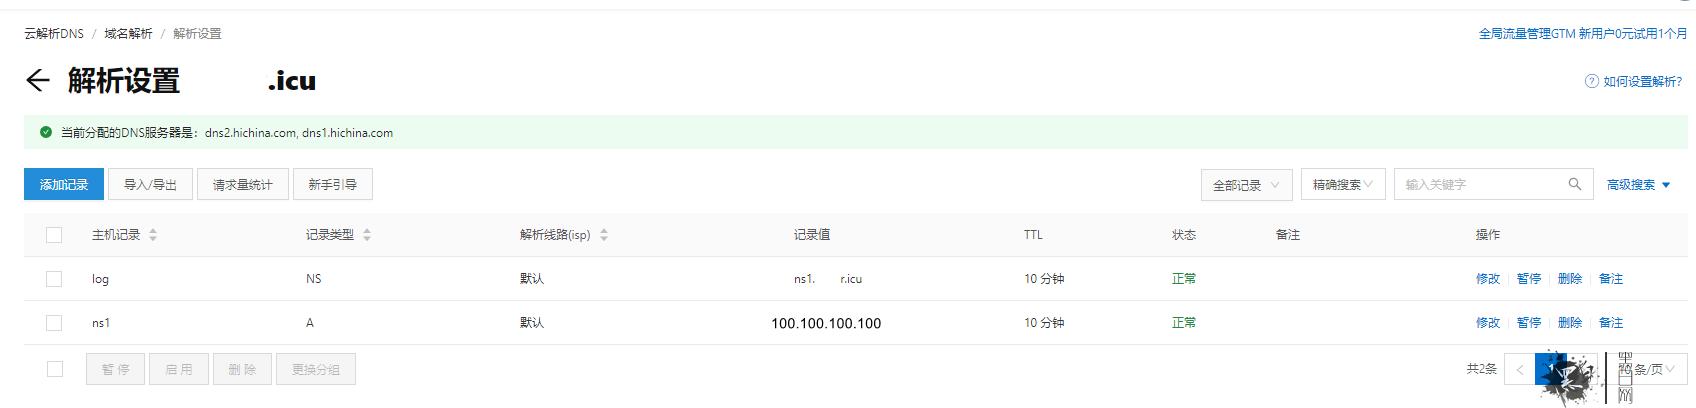 DNSLOG平台搭建从0到1